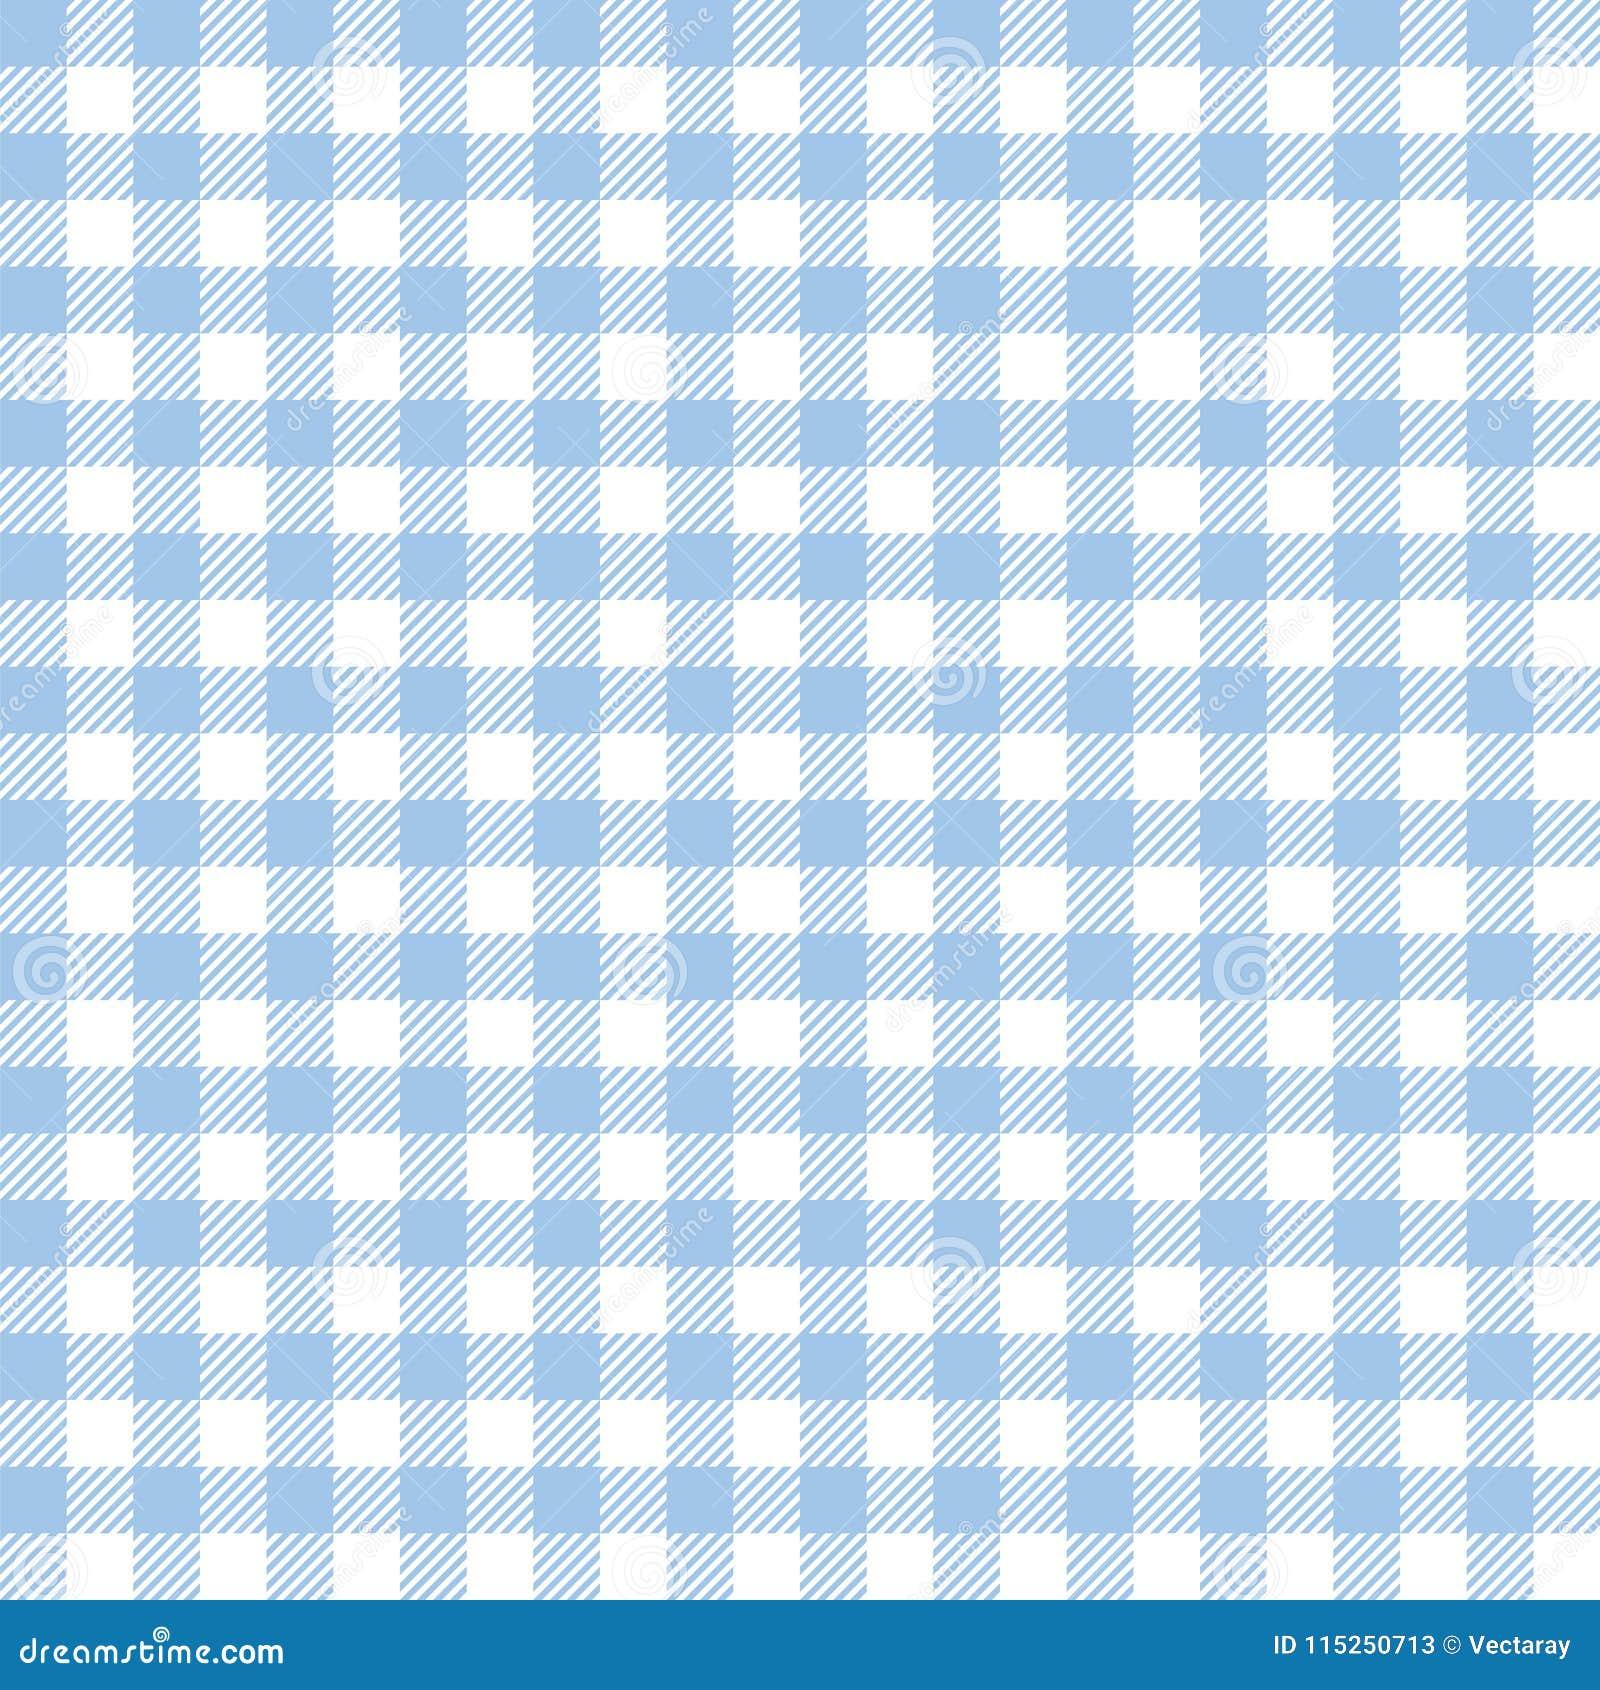 Seamless Light Blue Checkered Fabric Pattern Background